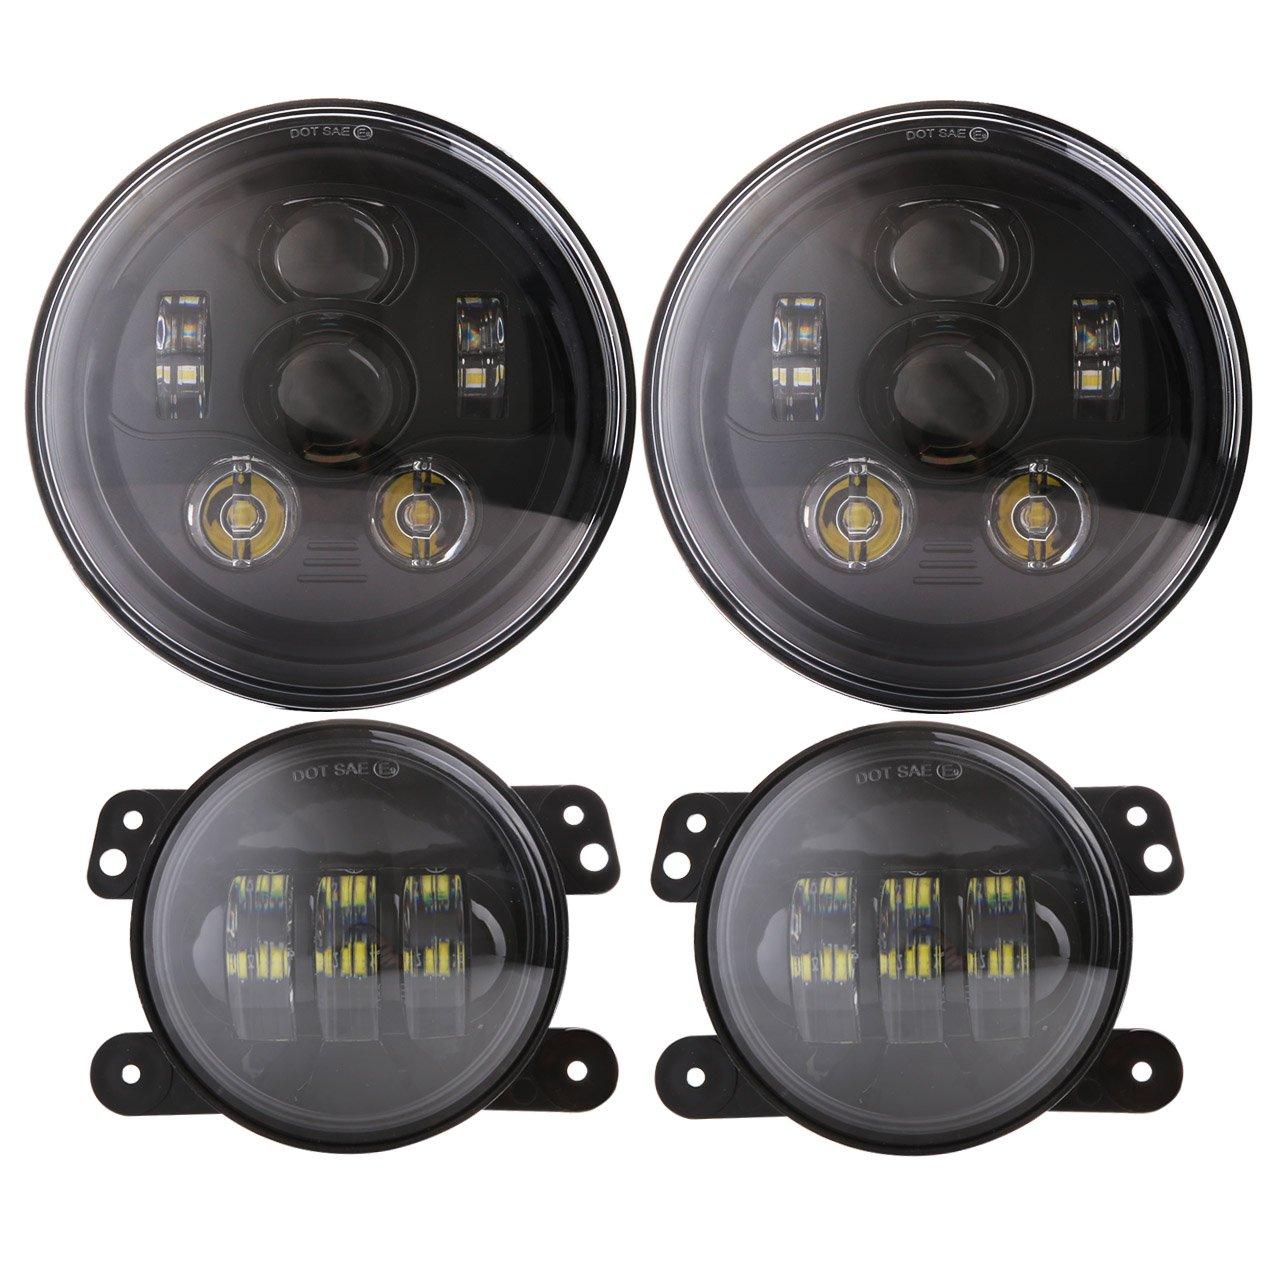 DOT Approved Angel Eyes White DRL Turn Signal 7 inch Round LED Headlight+4 inch Halo Ring LED Fog Lights for Jeep Wrangler 1997-2018 Unlimited JK LJ TJ 4 door 2 Door Driving Light JKOL